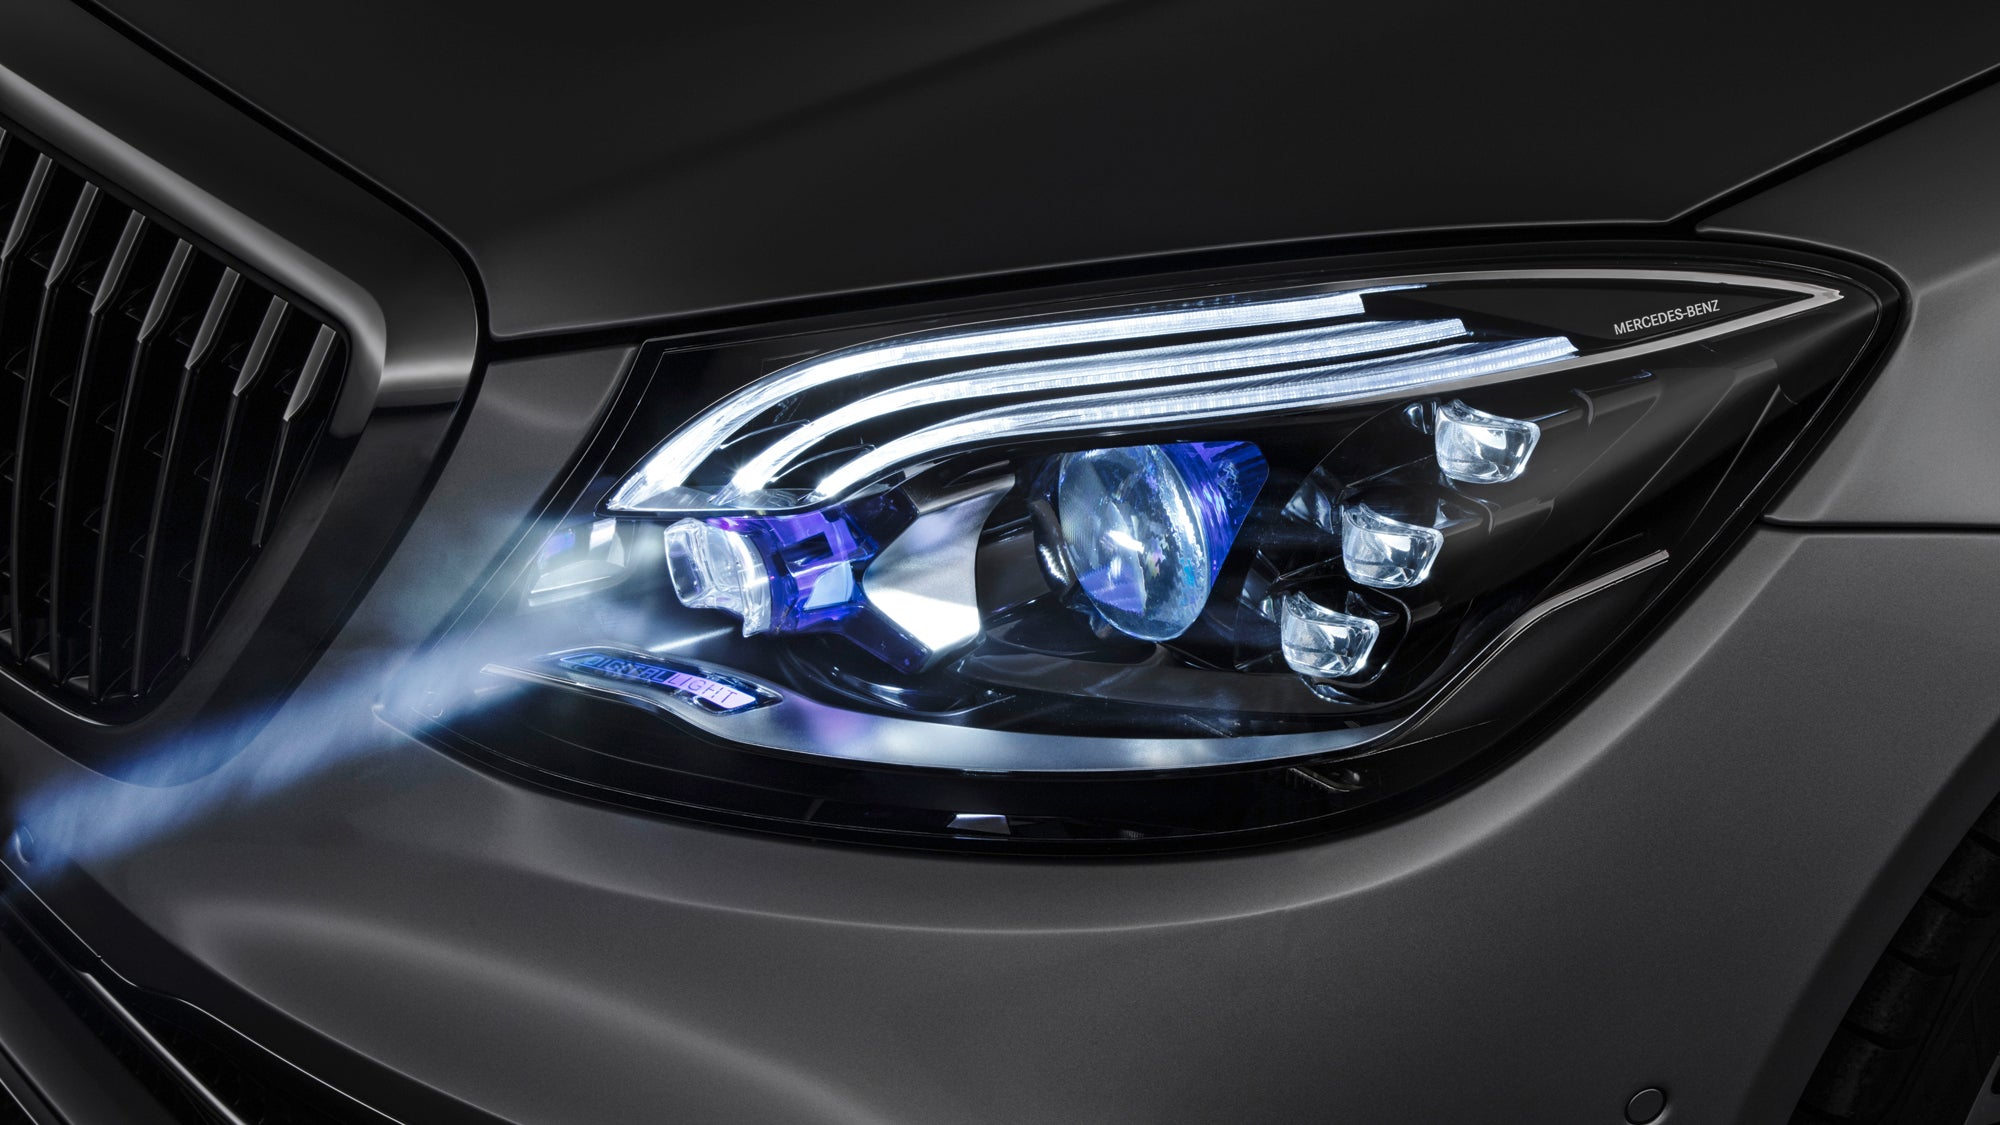 Mercedes Futuristic Headlights Shine Warning Symbols On The Road